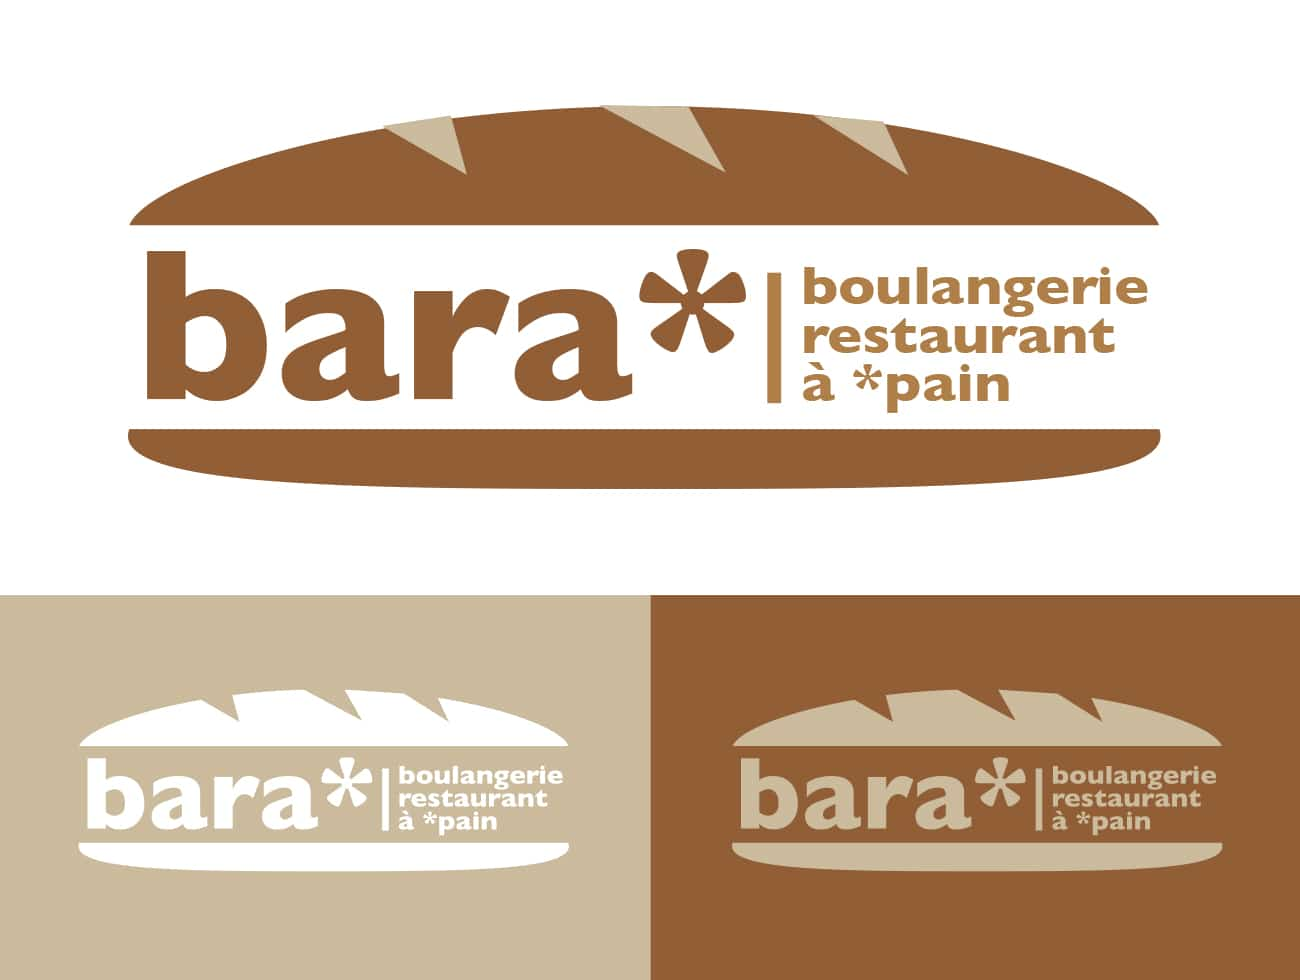 2-bara-boulangerie-positionnement-identite-visuelle-marketing-communication-bretagne-lorient